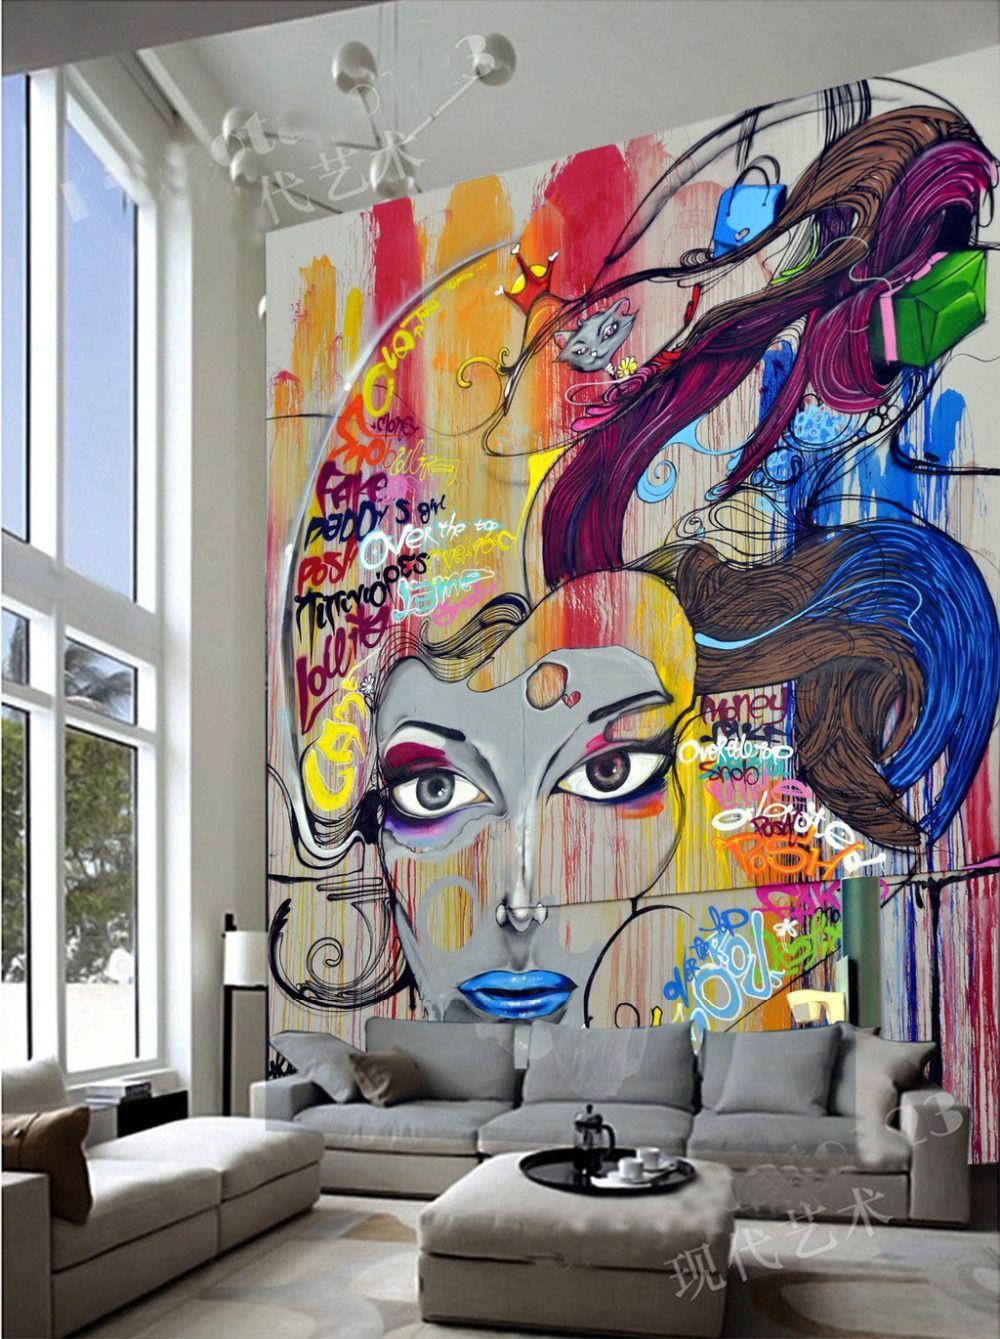 Large Mural Wallpaper Color Graffiti The Living Room Tv Background Wall Paper Ktv Bar Wallpaper Bedroom Sofa Muurschildering Behang Muurschildering Verf Muren